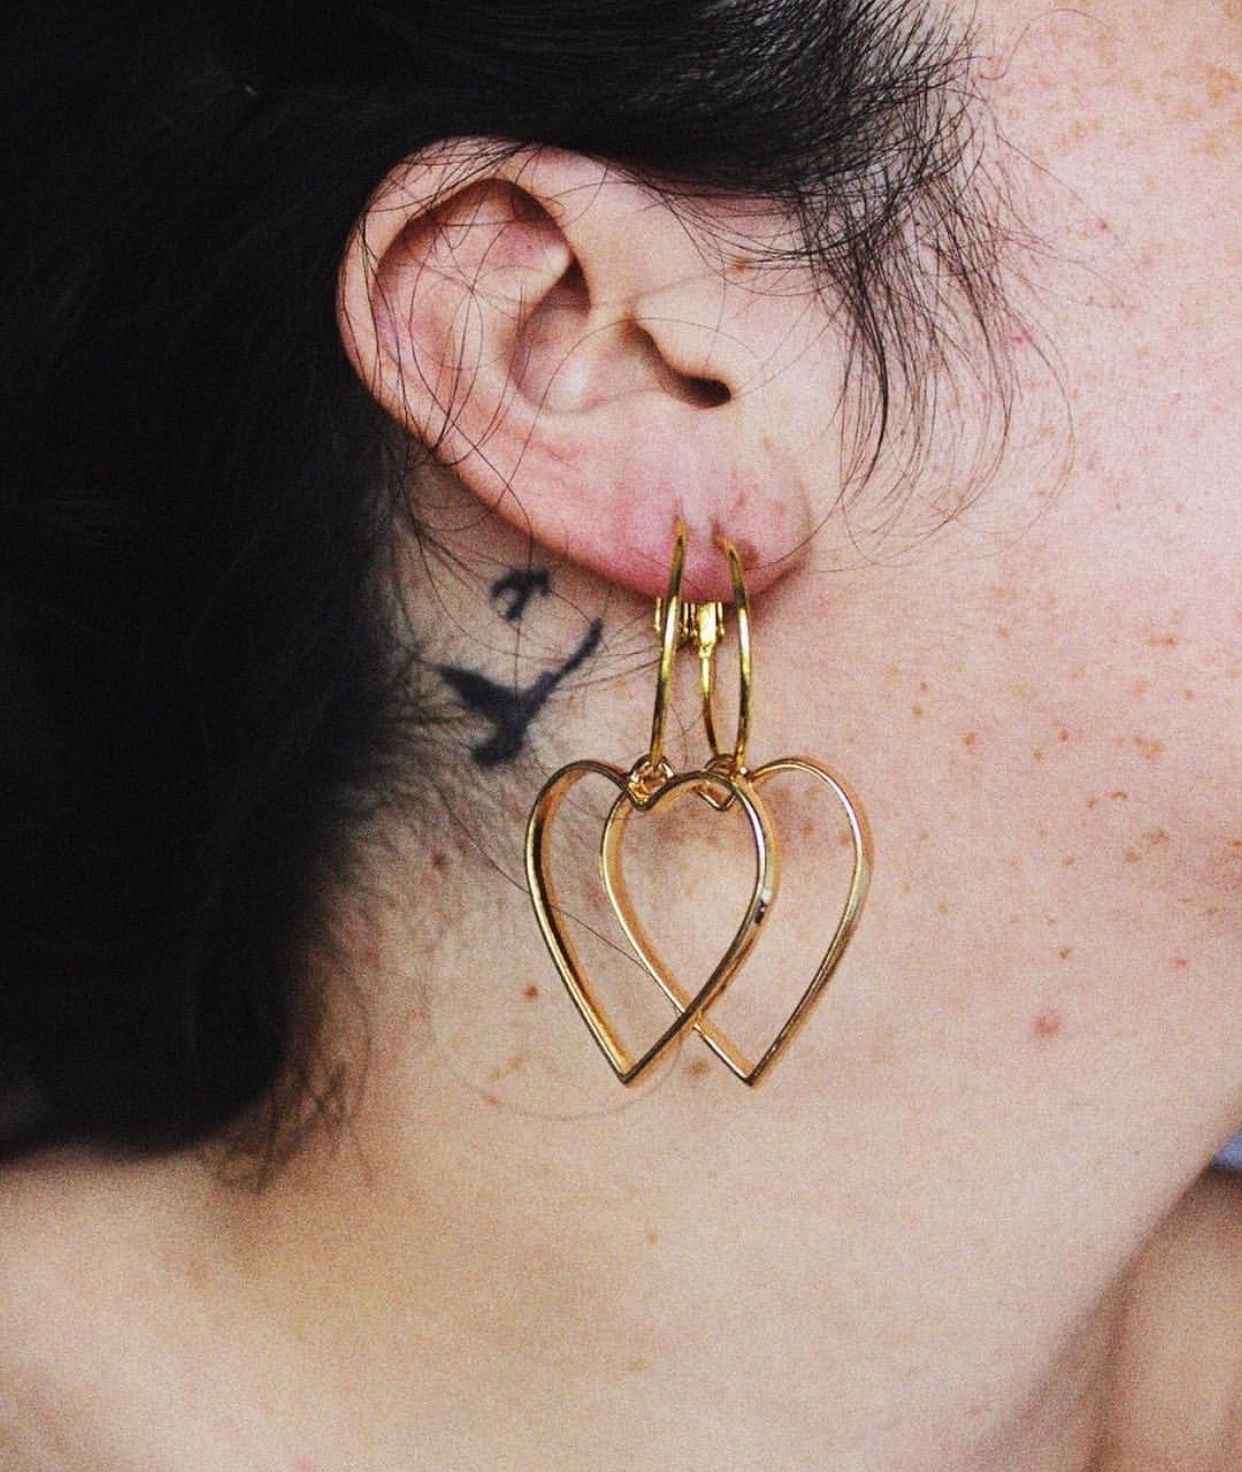 Bump above nose piercing  Pin by Melanie on Piercings u Jewelry  Pinterest  Jewel Summer